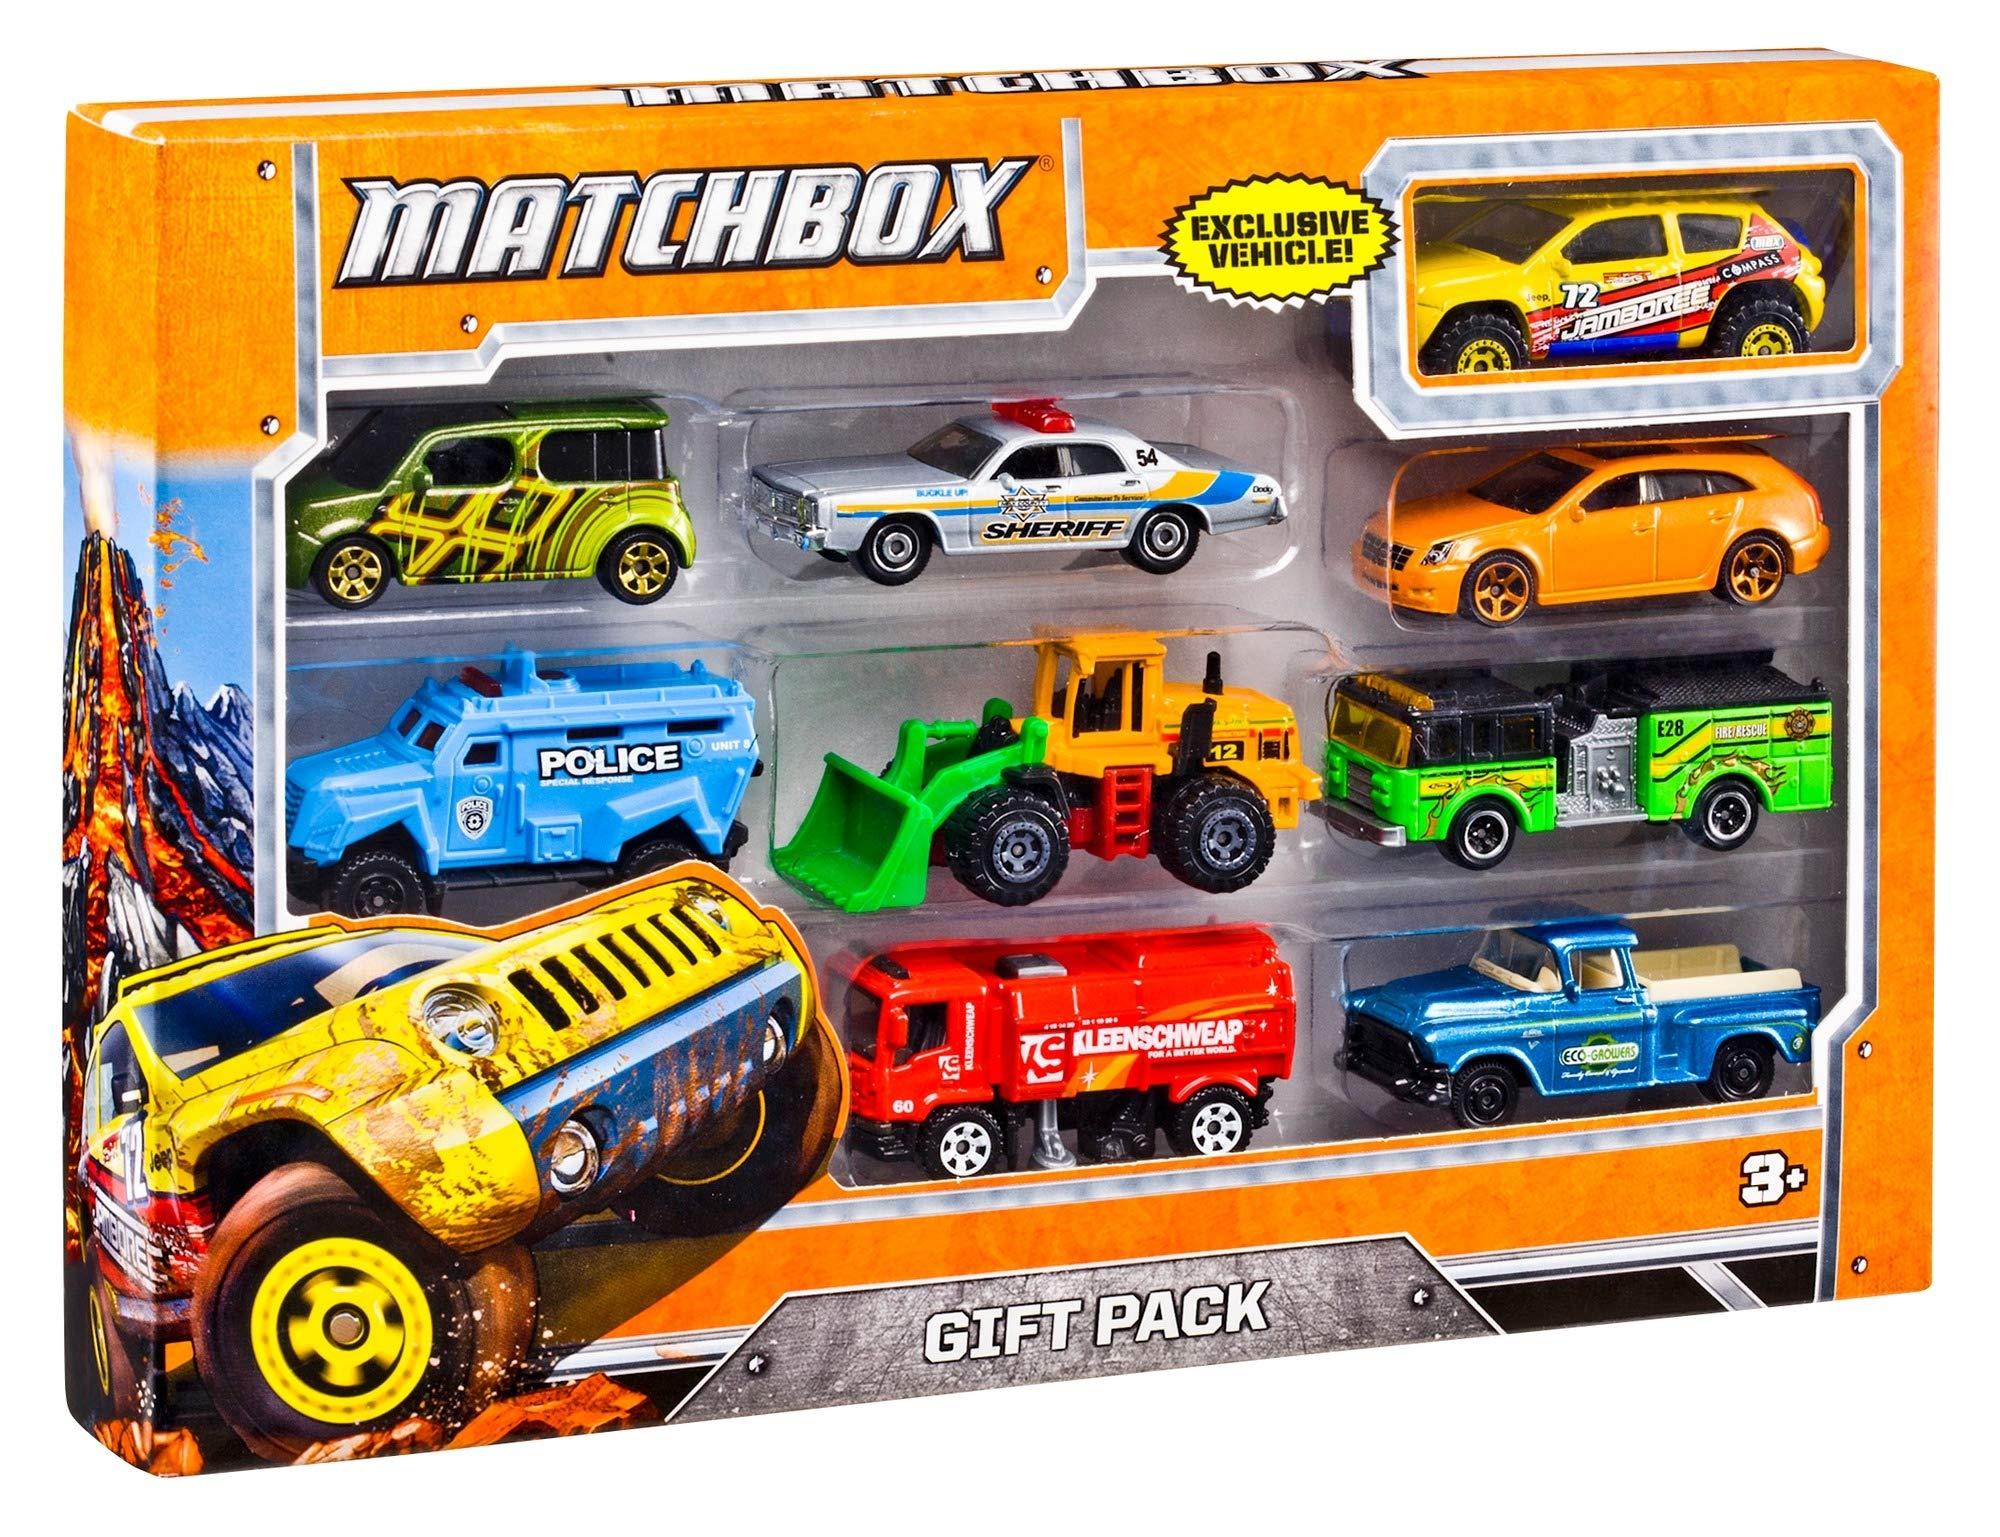 Matchbox Pack de 9 Coches Juguetes, Modelos Surtidos (Mattel X7111): Amazon.es: Juguetes y juegos